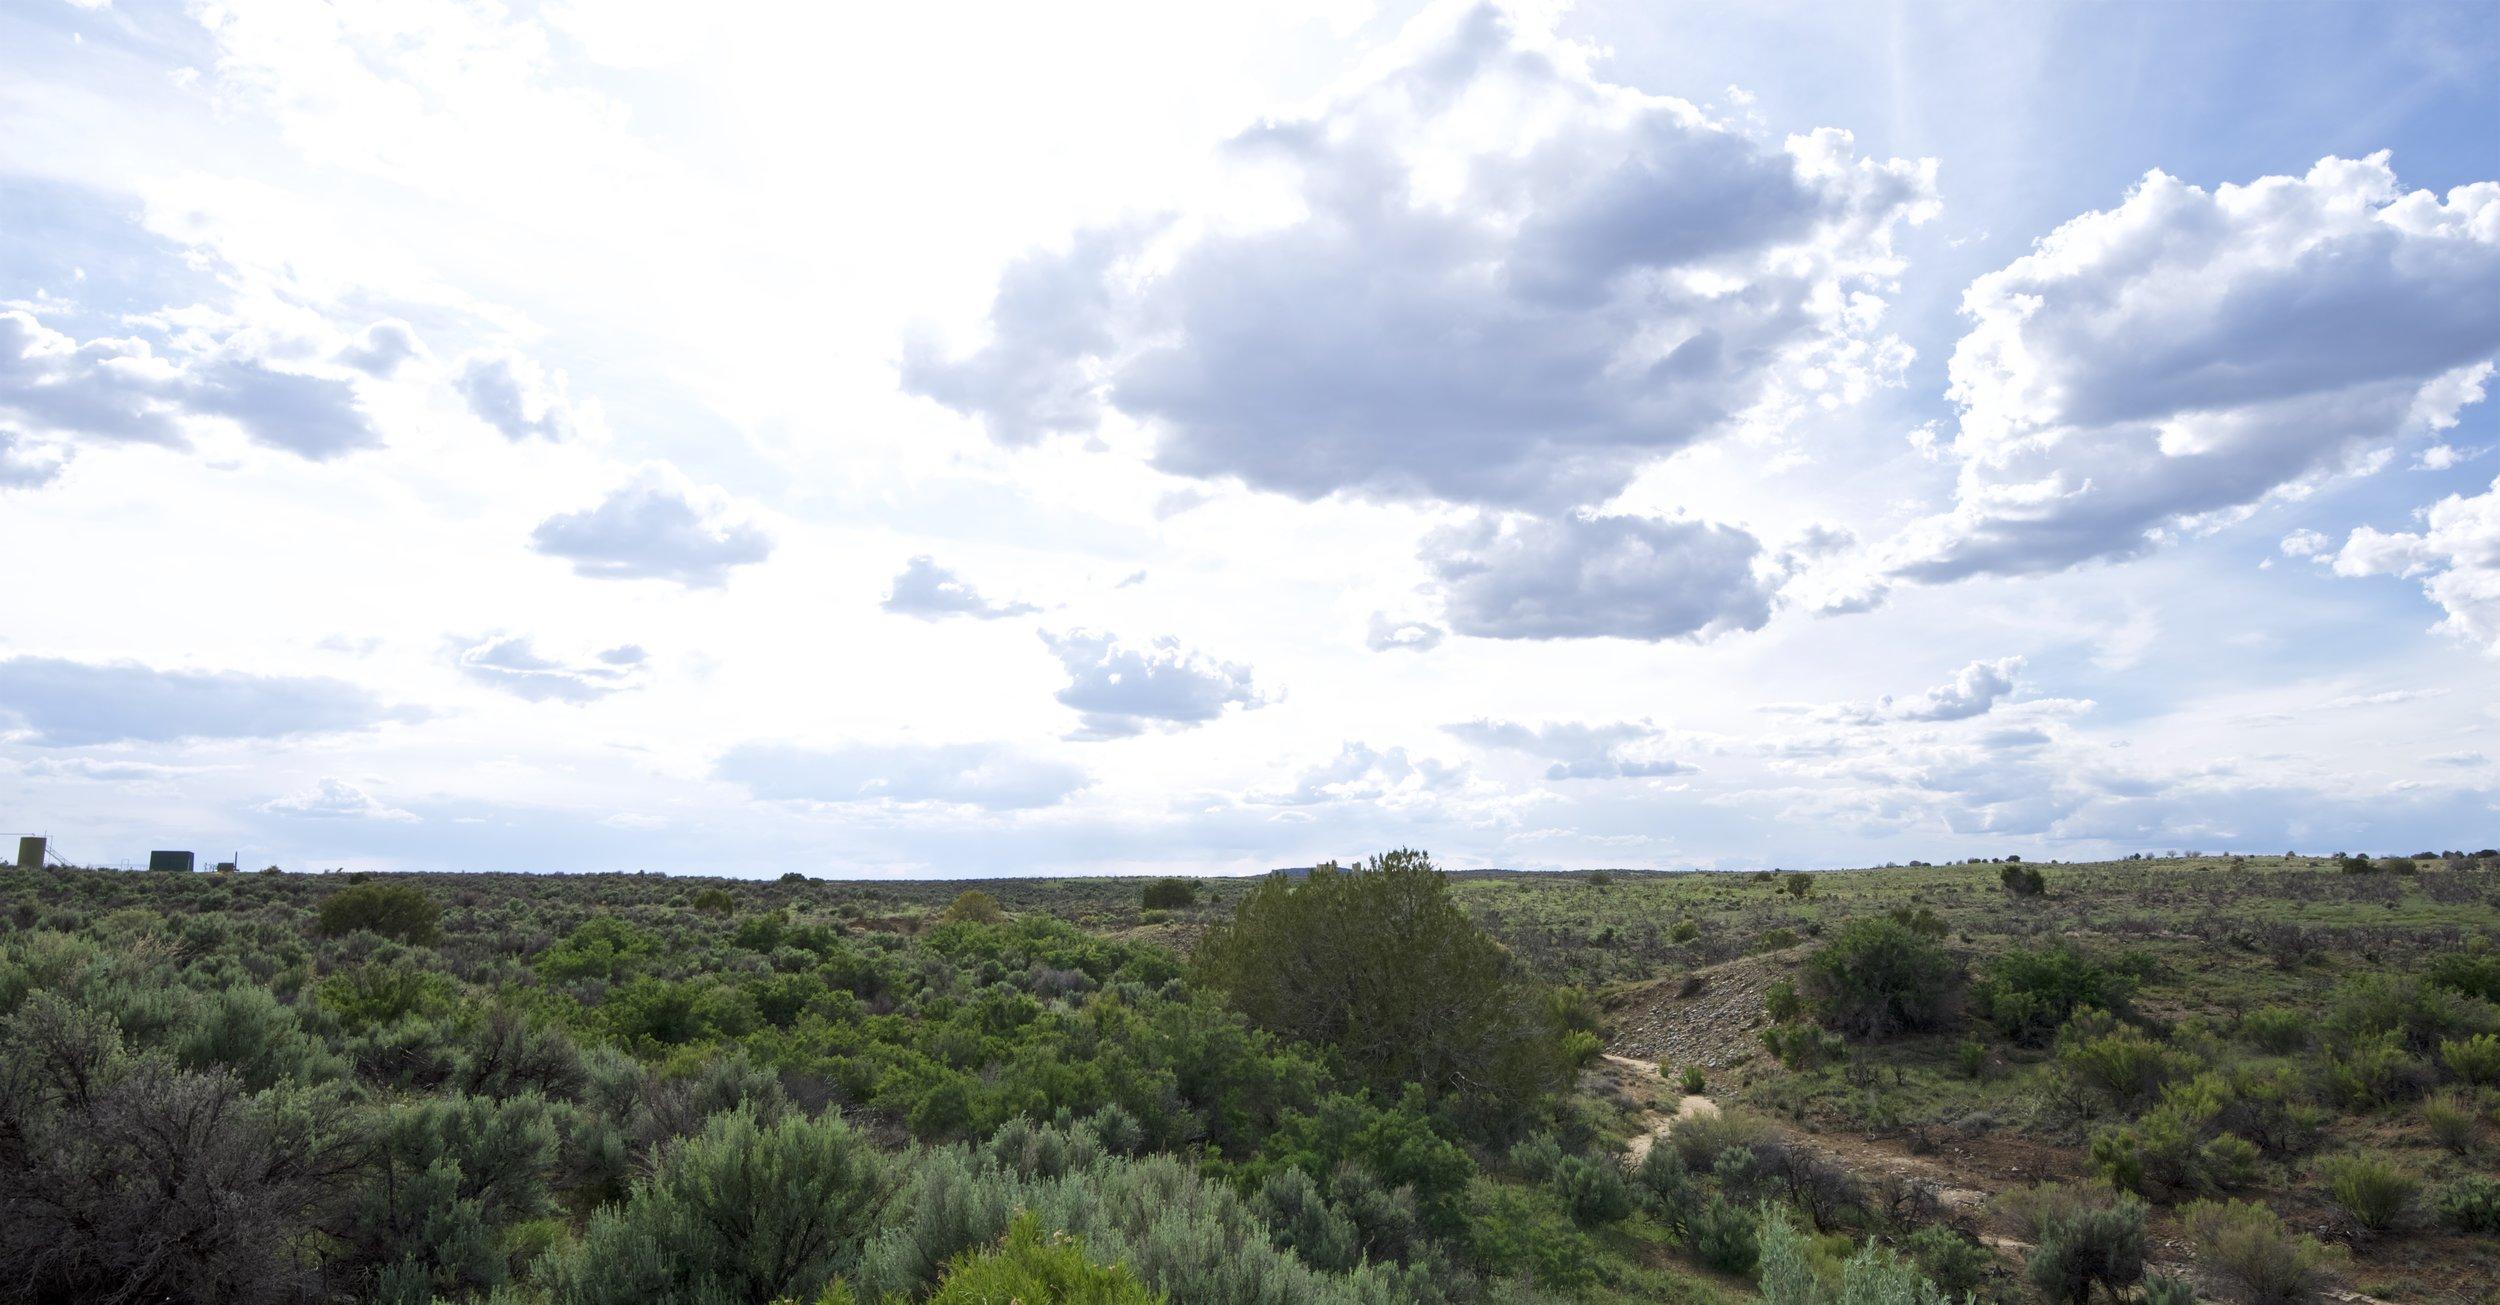 SJNM-4393-navajo-dam-127992.jpg